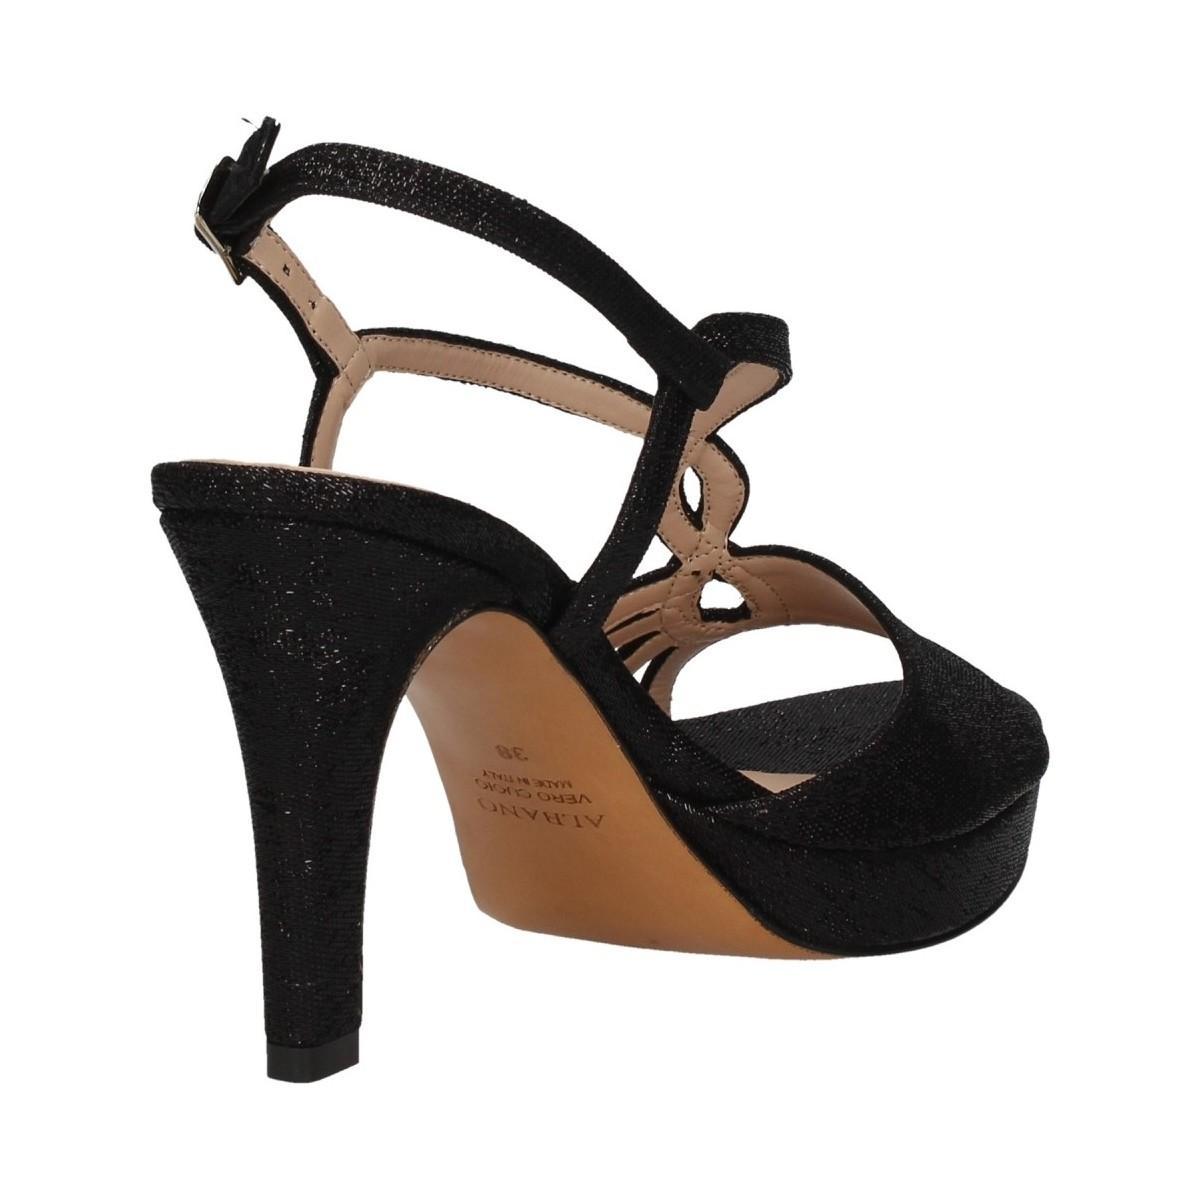 2026 Sandales Albano en coloris Noir